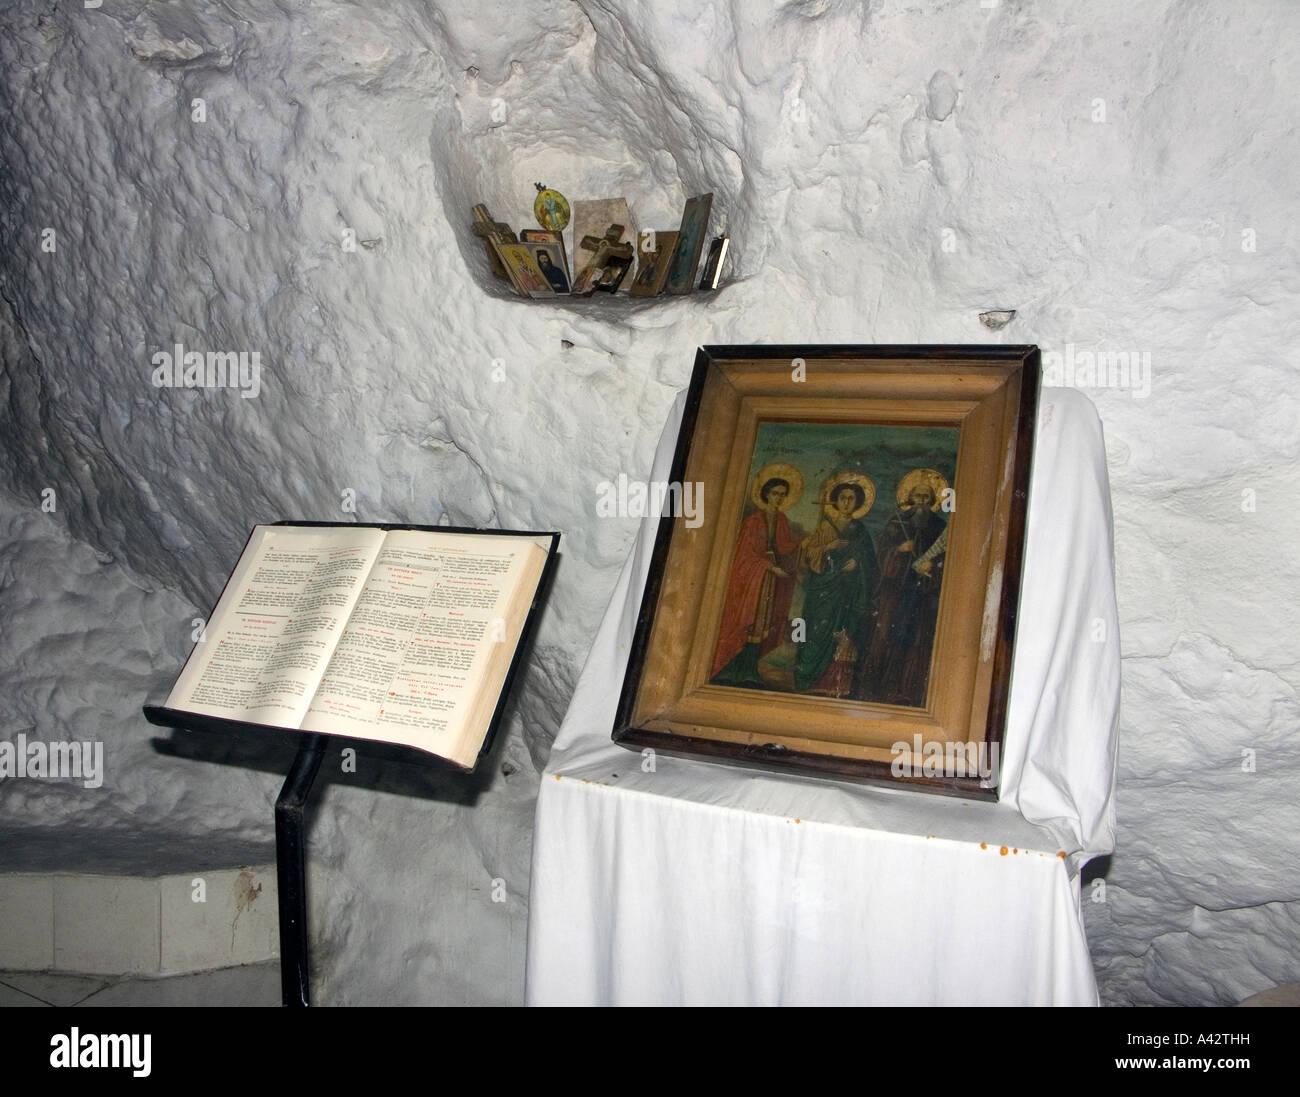 St Photis Shrine, Kalymnos Greece. - Stock Image